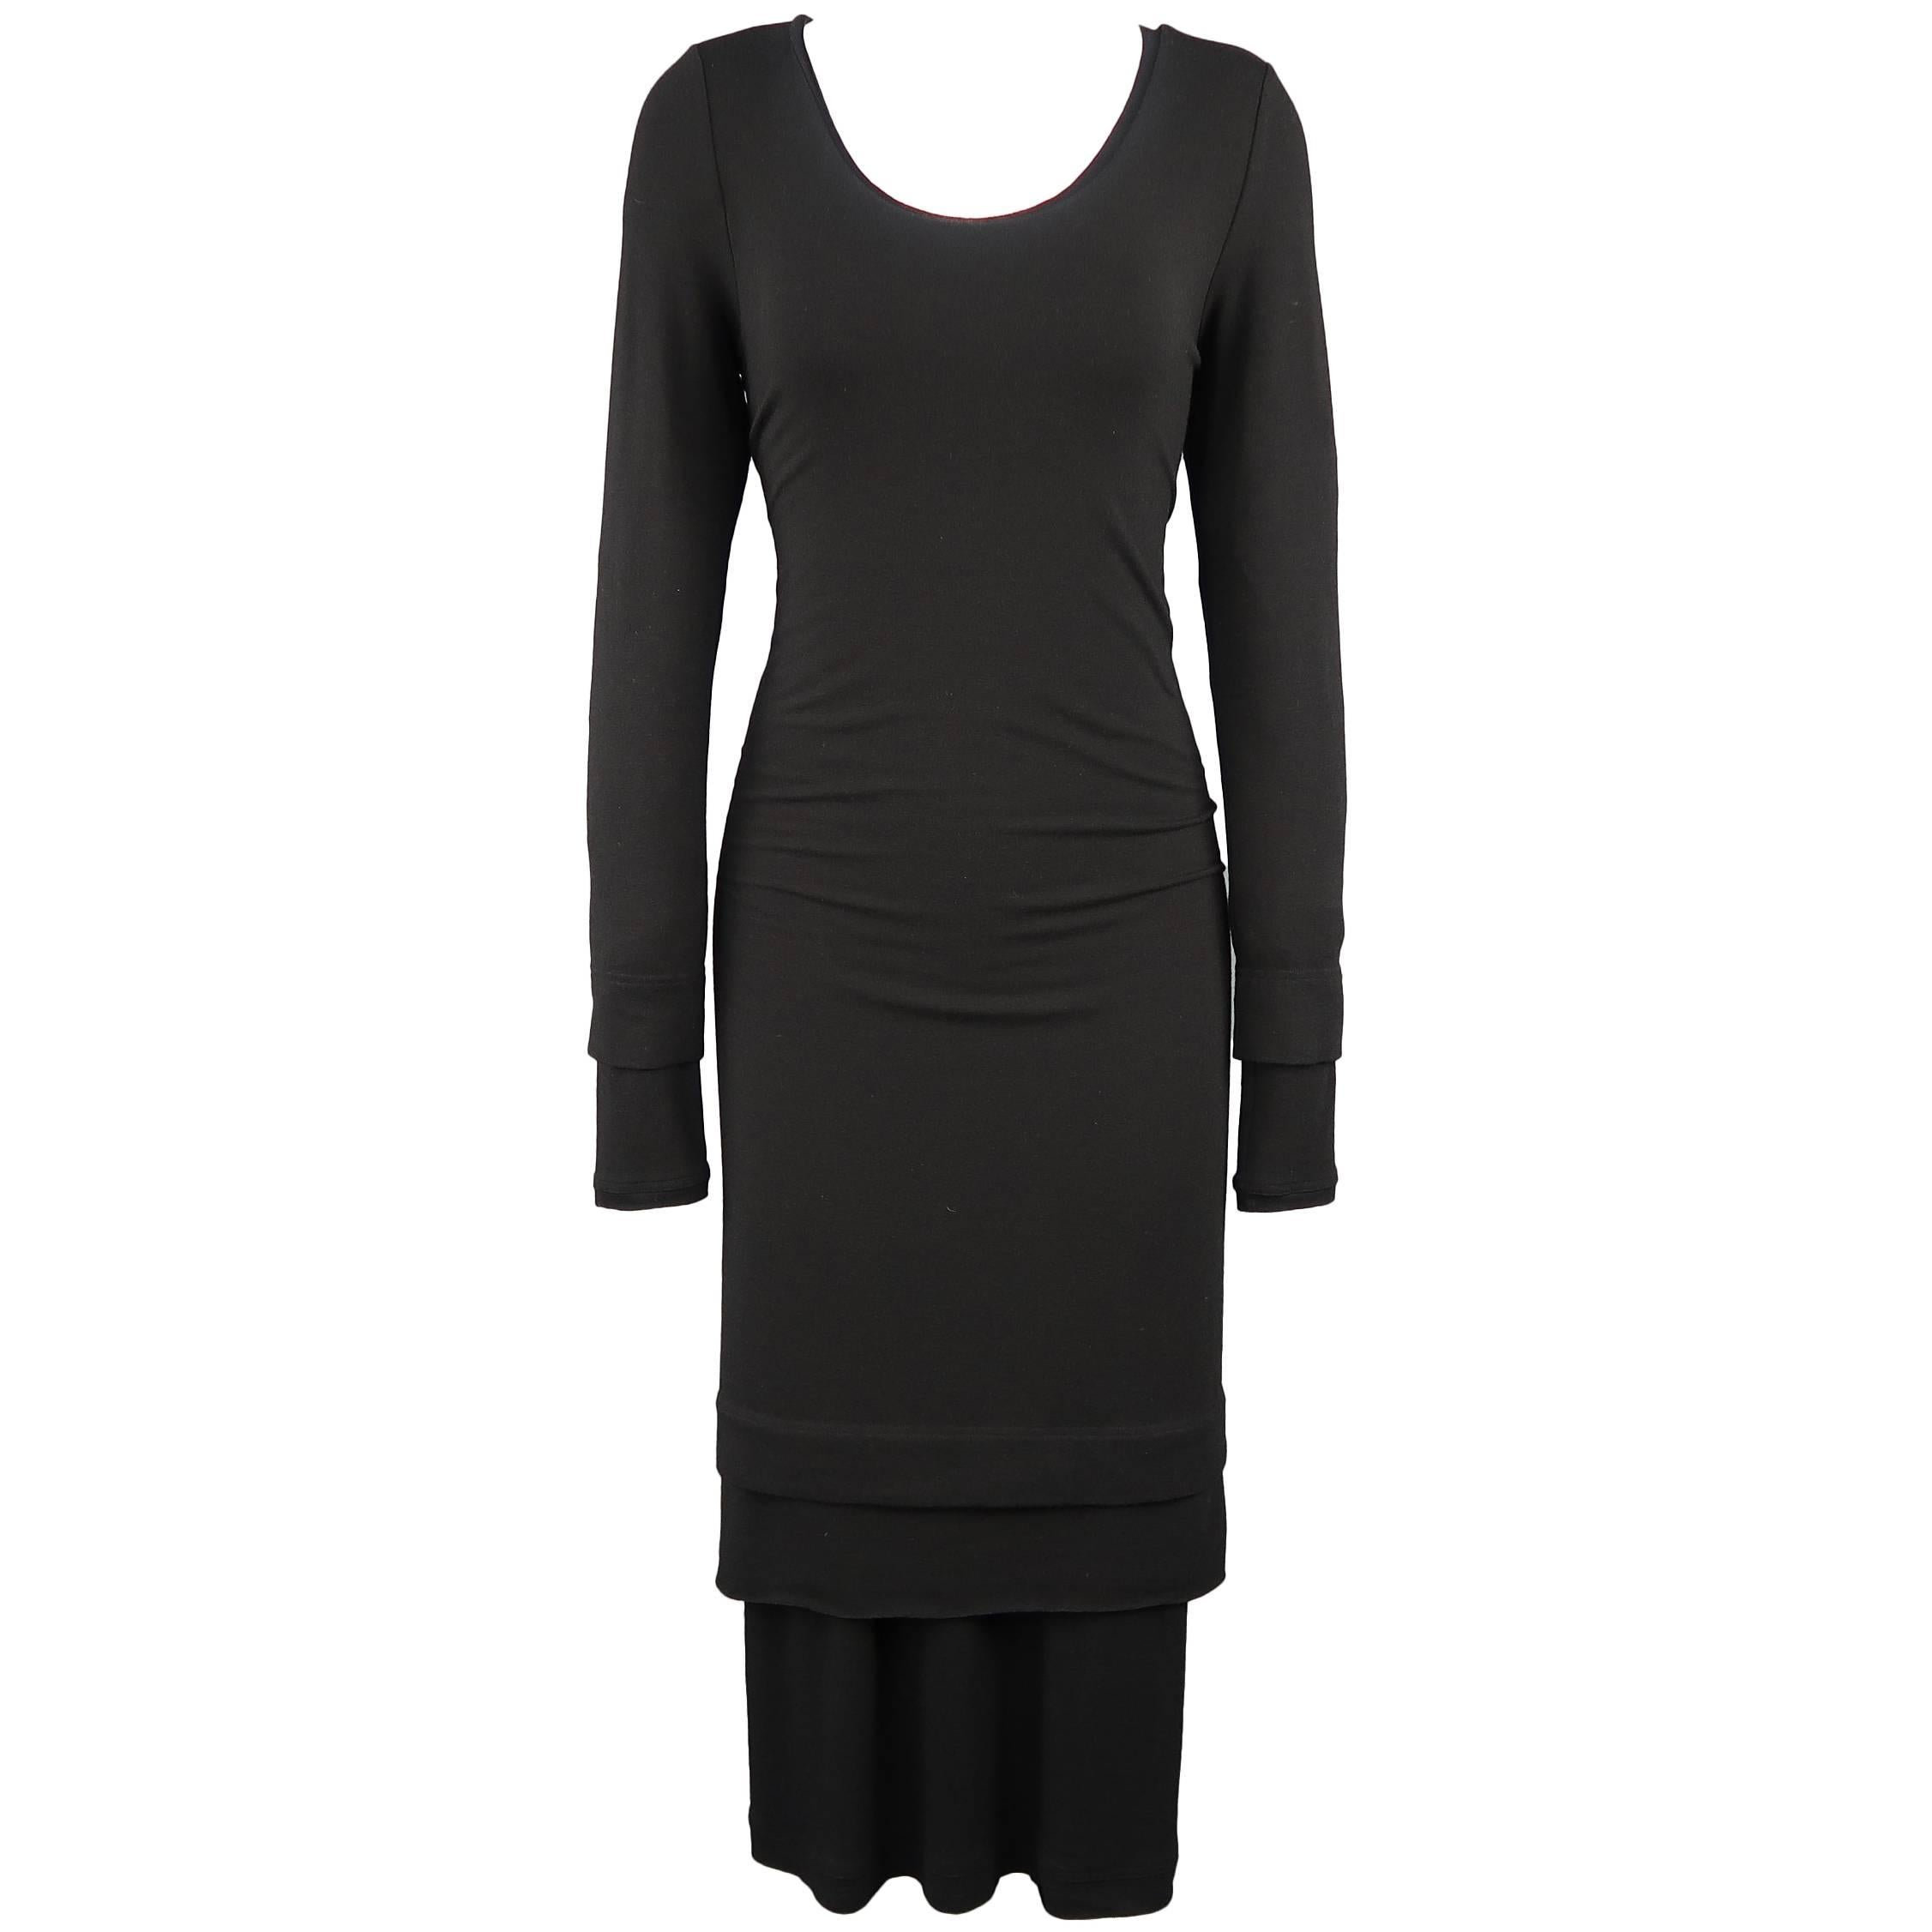 DONNA KARAN Size M Black Layered Jersey Long Sleeve Maxi Sheath Dress